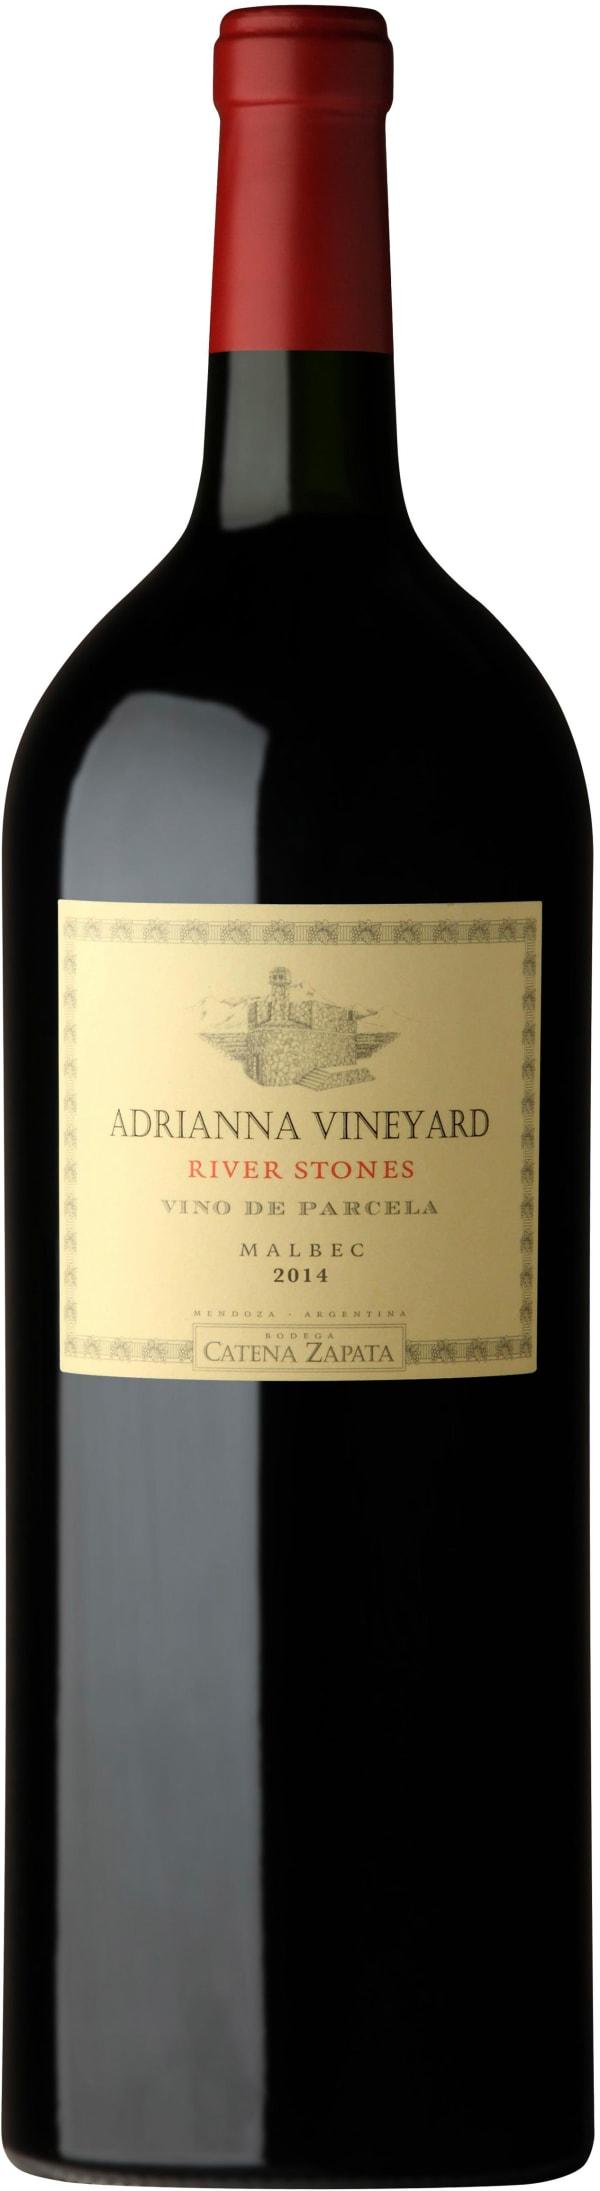 Adrianna Vineyard River Stones Malbec 2014